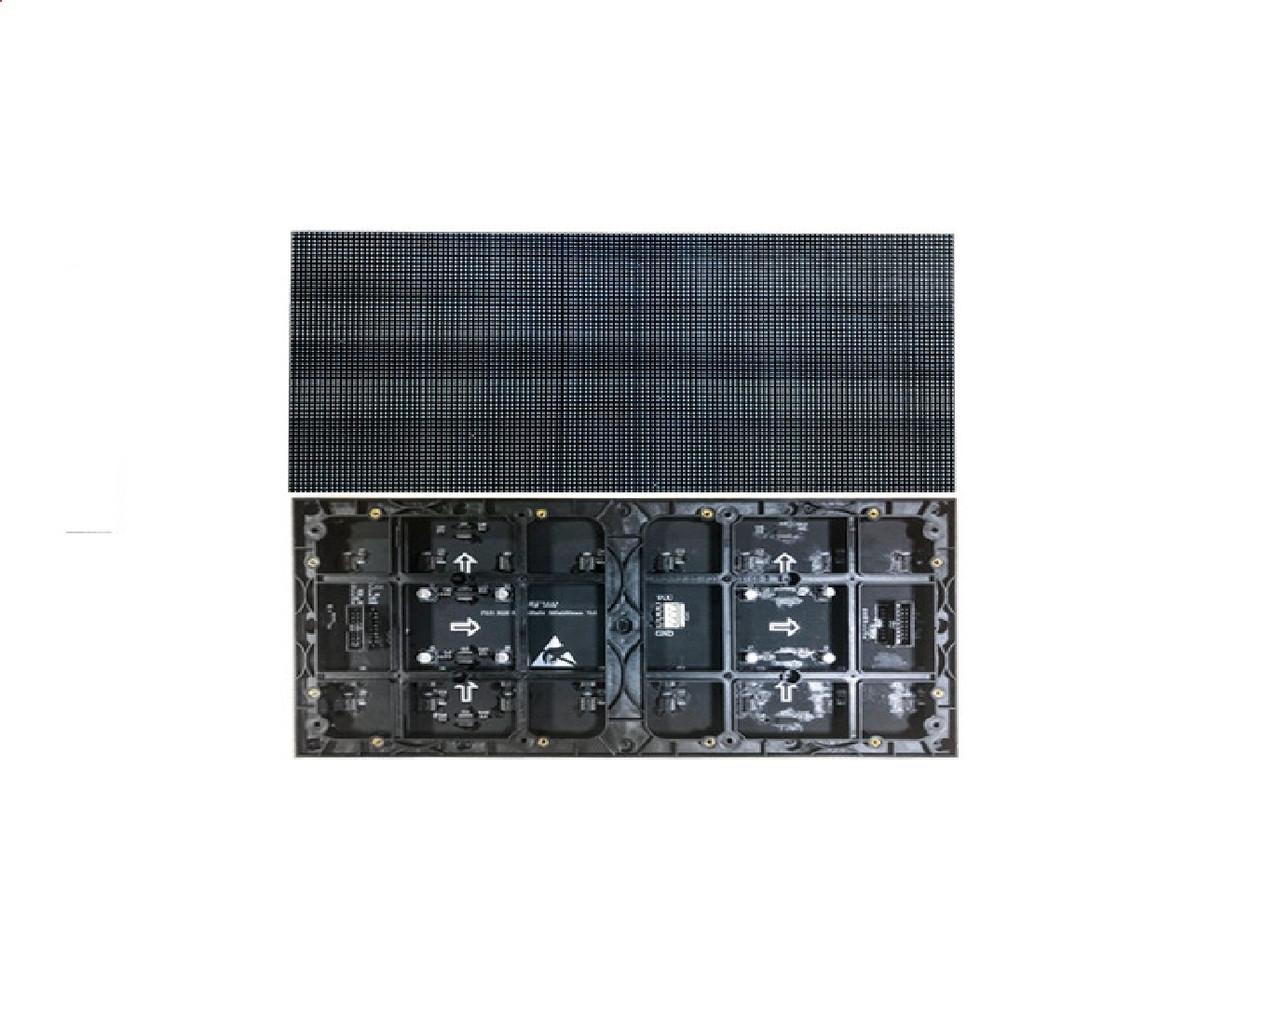 LED светодиодный модуль (внутренний) SMD, P2.5 320x160mm